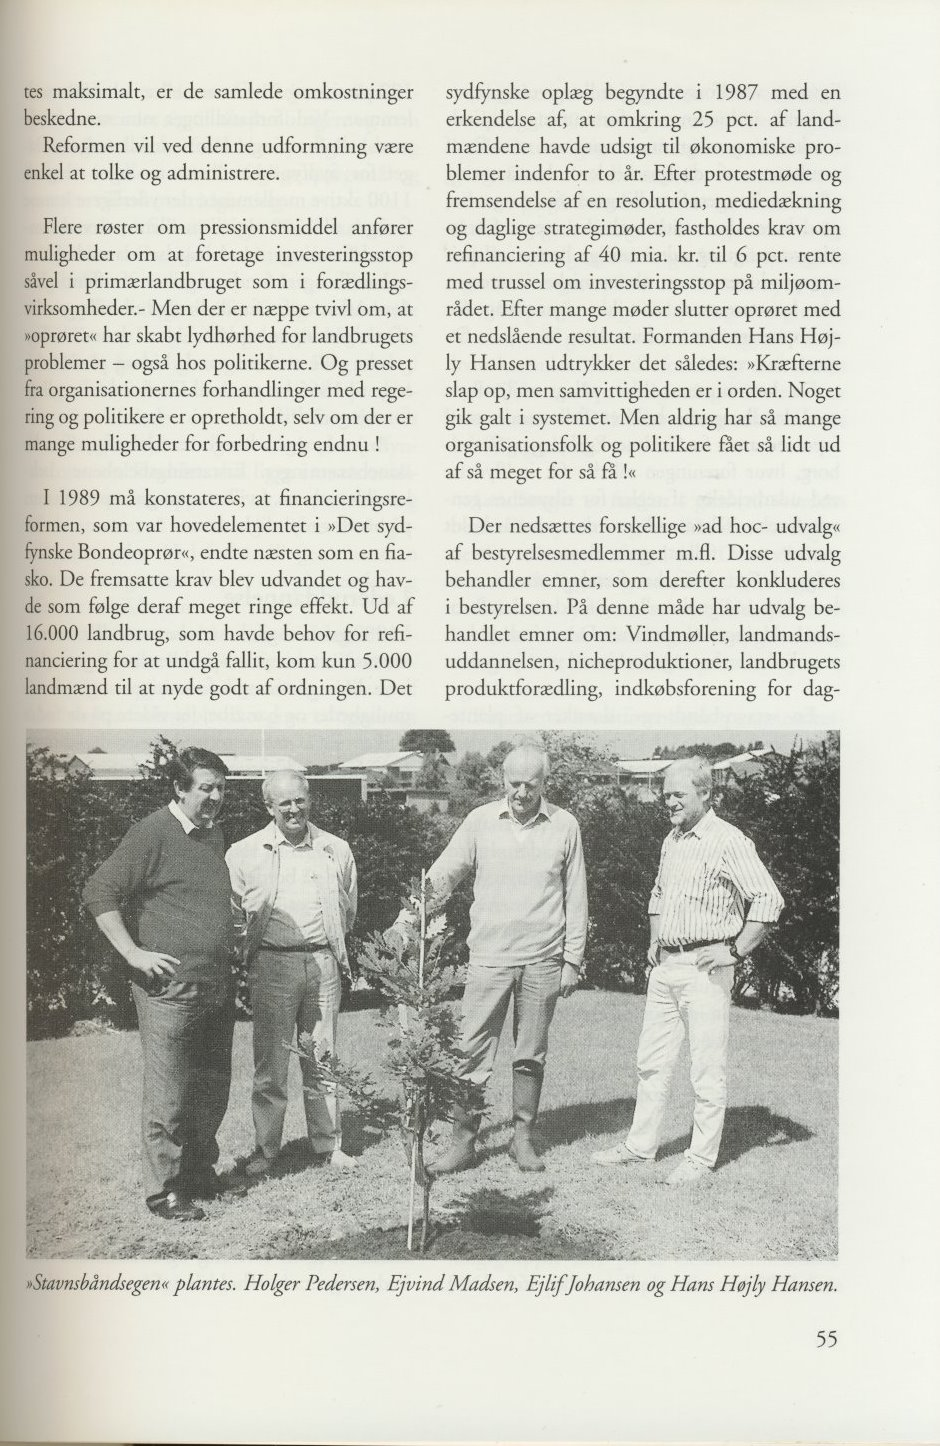 Sv. & Omegns landbf 1901-2001 - Det sydfynske bondeoprør (5)